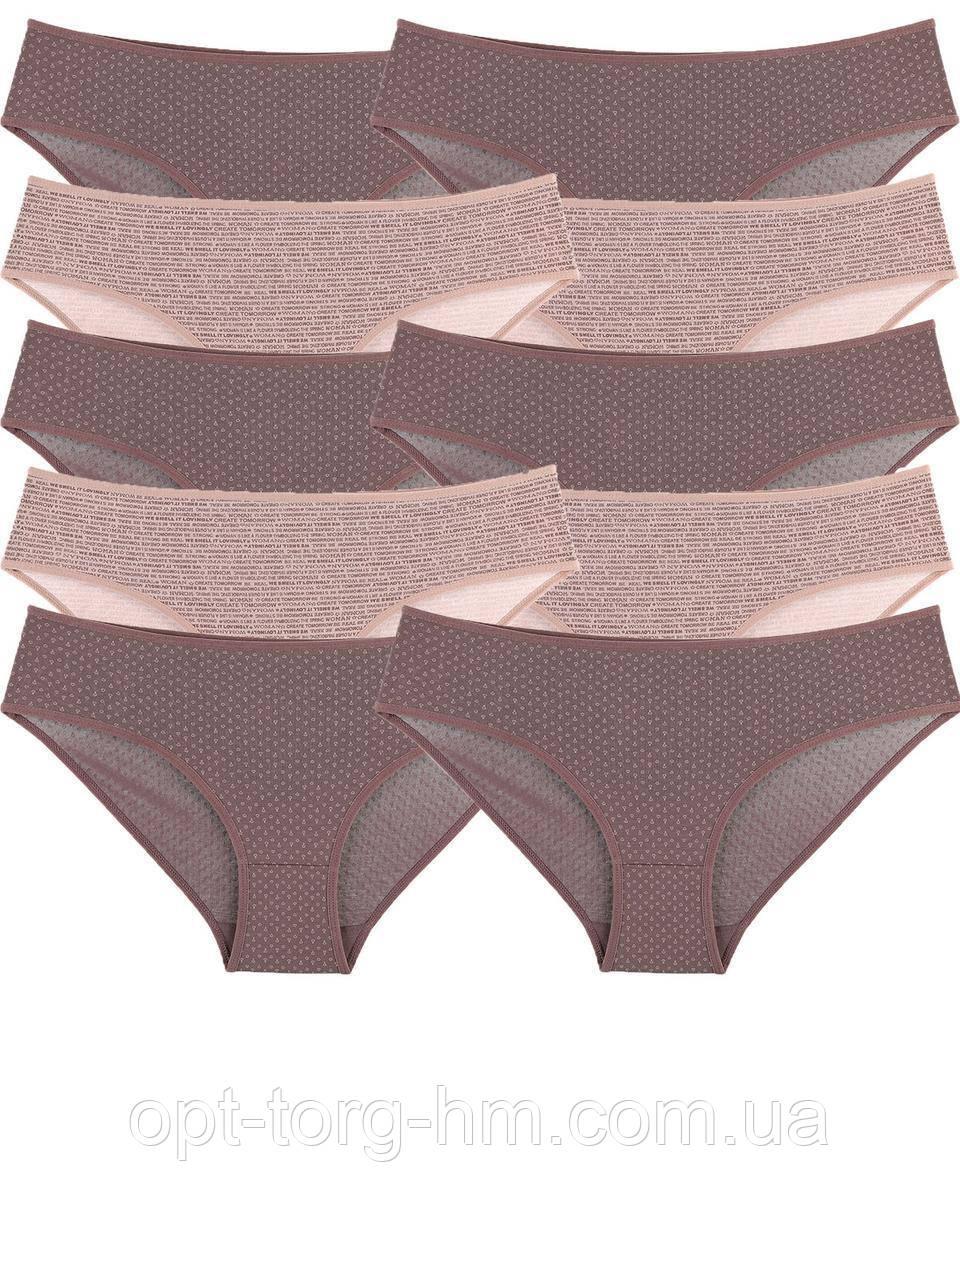 Женские трусы Donella. Размер XL